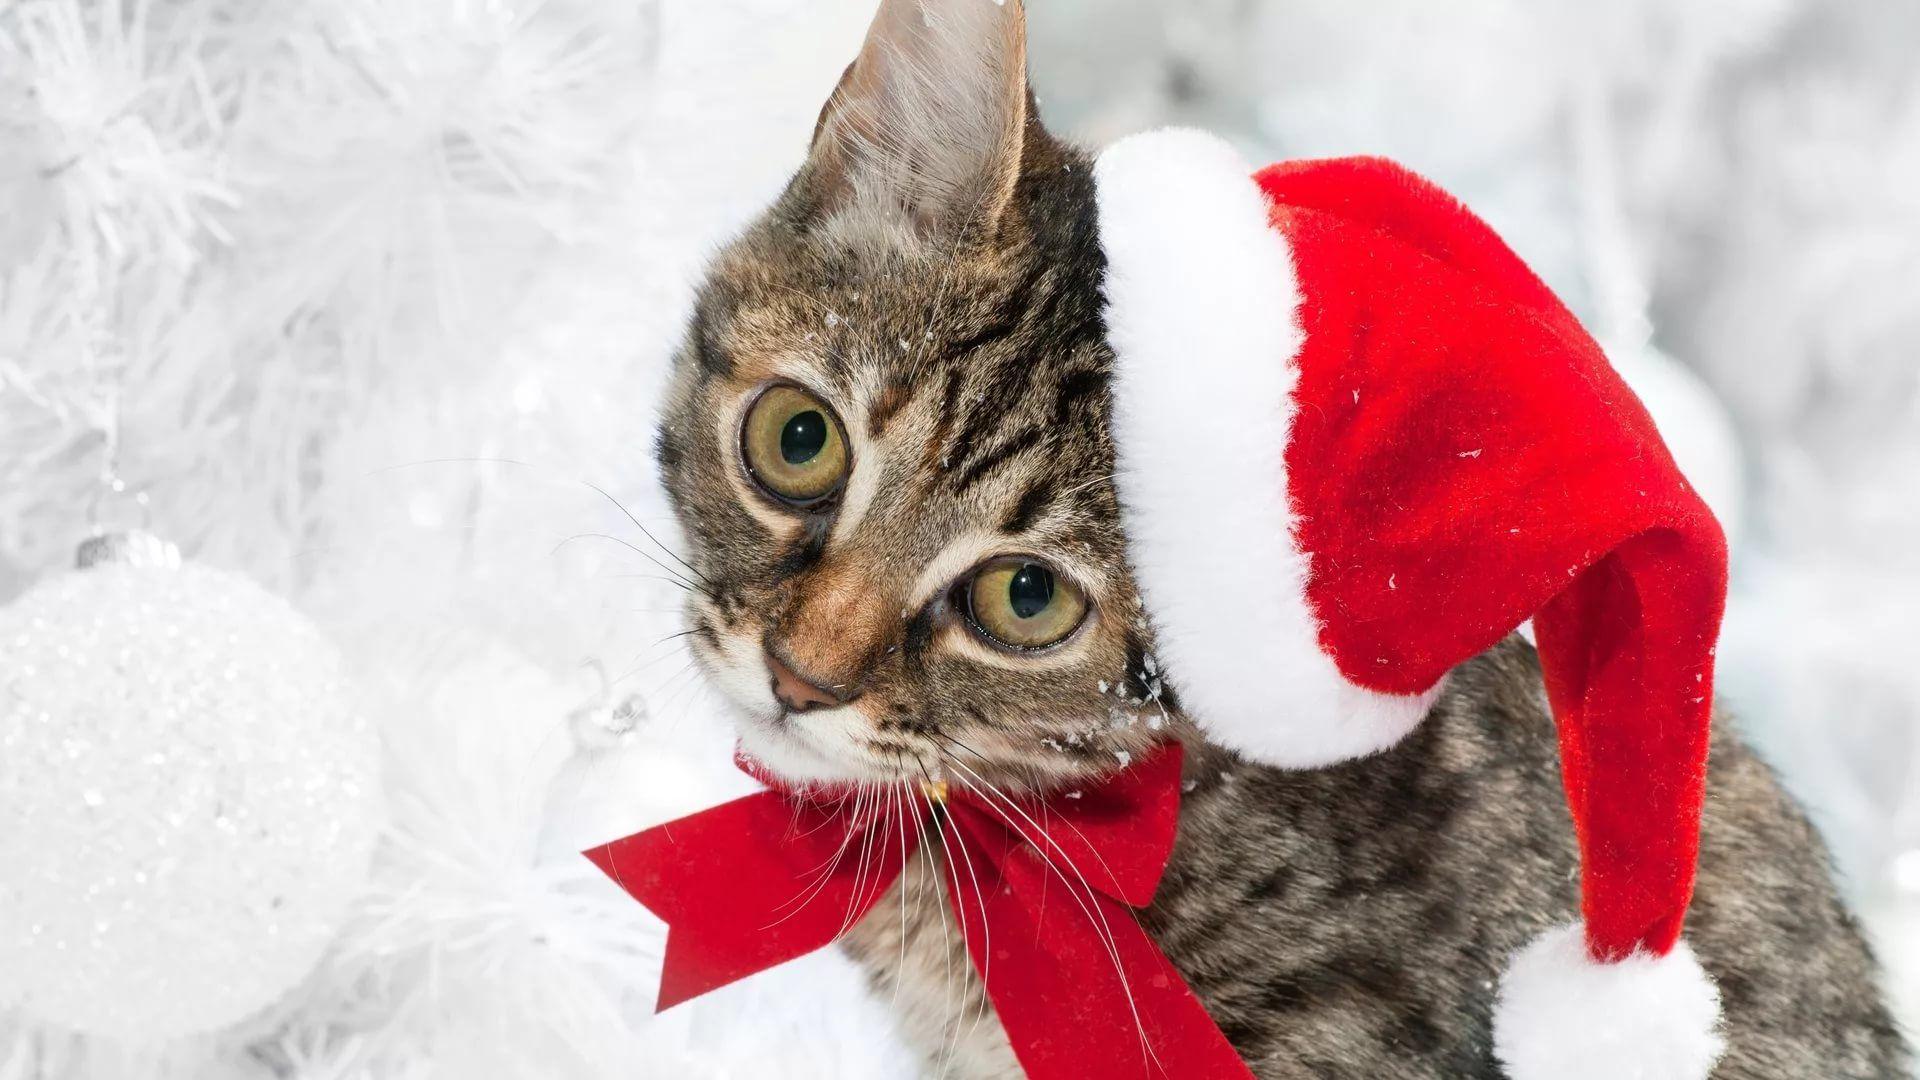 Christmas Cat 1080p Wallpaper